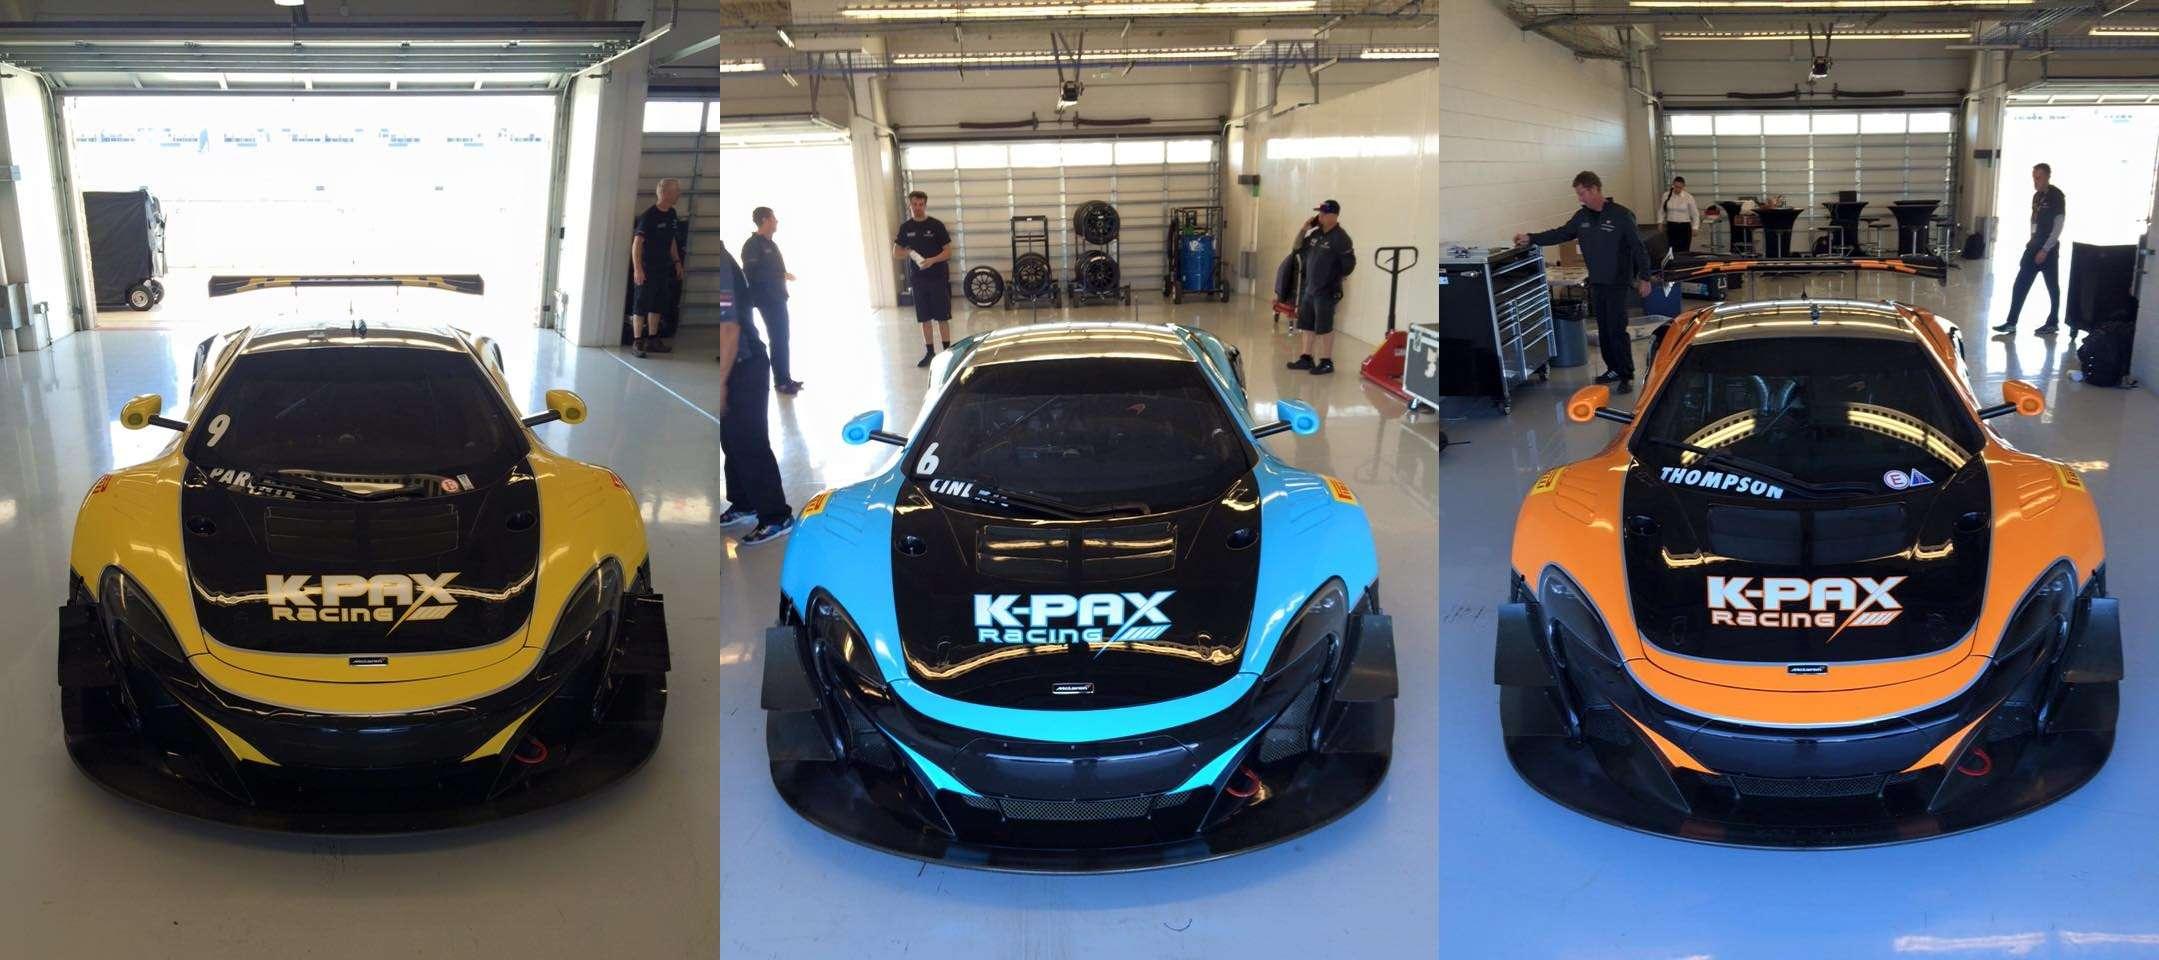 SCE Pirelli World Challenge 2016 - Version 1.1 Released Kpax10